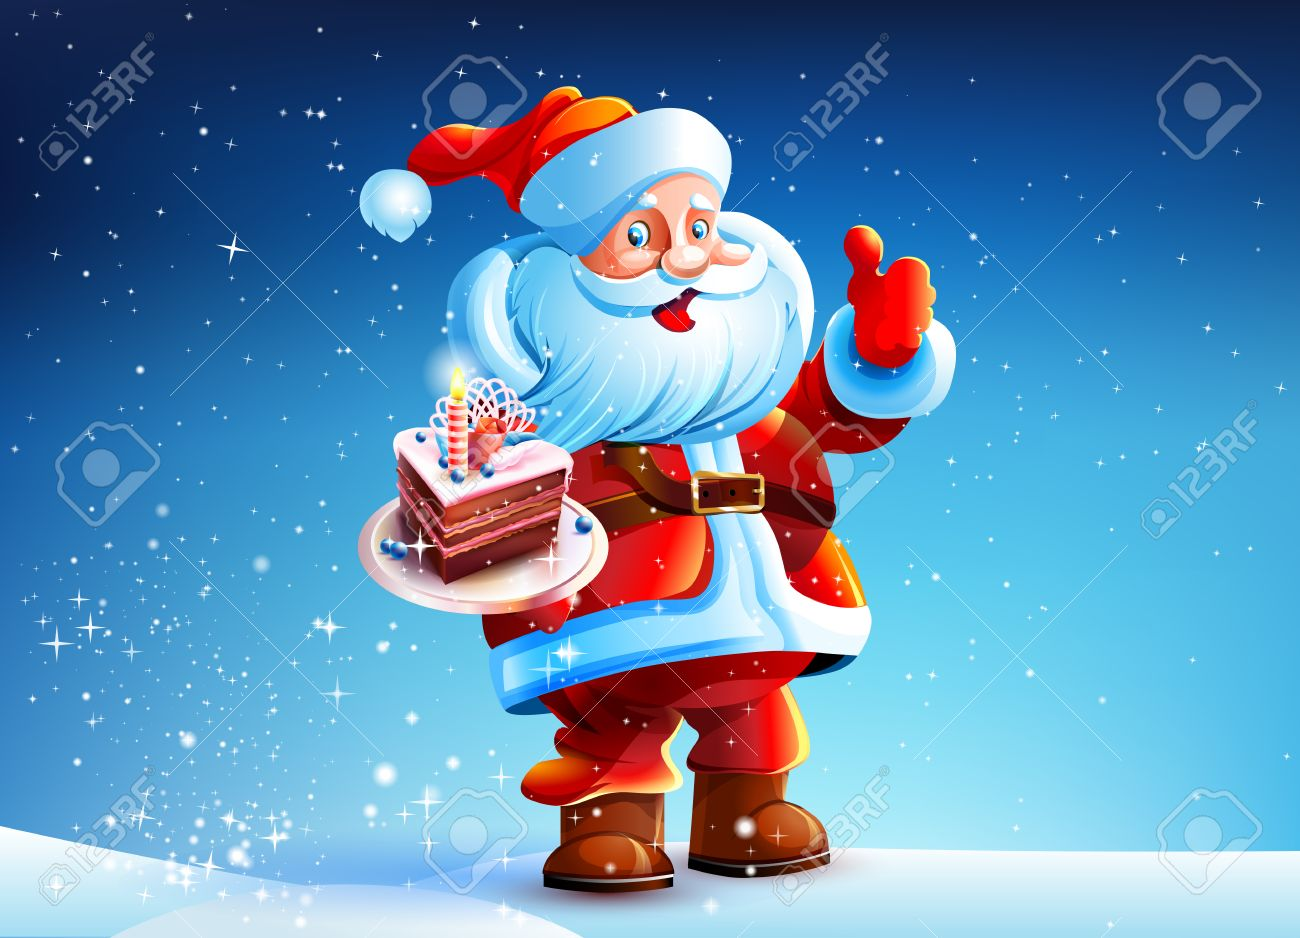 Santa claus eating cake clipart.